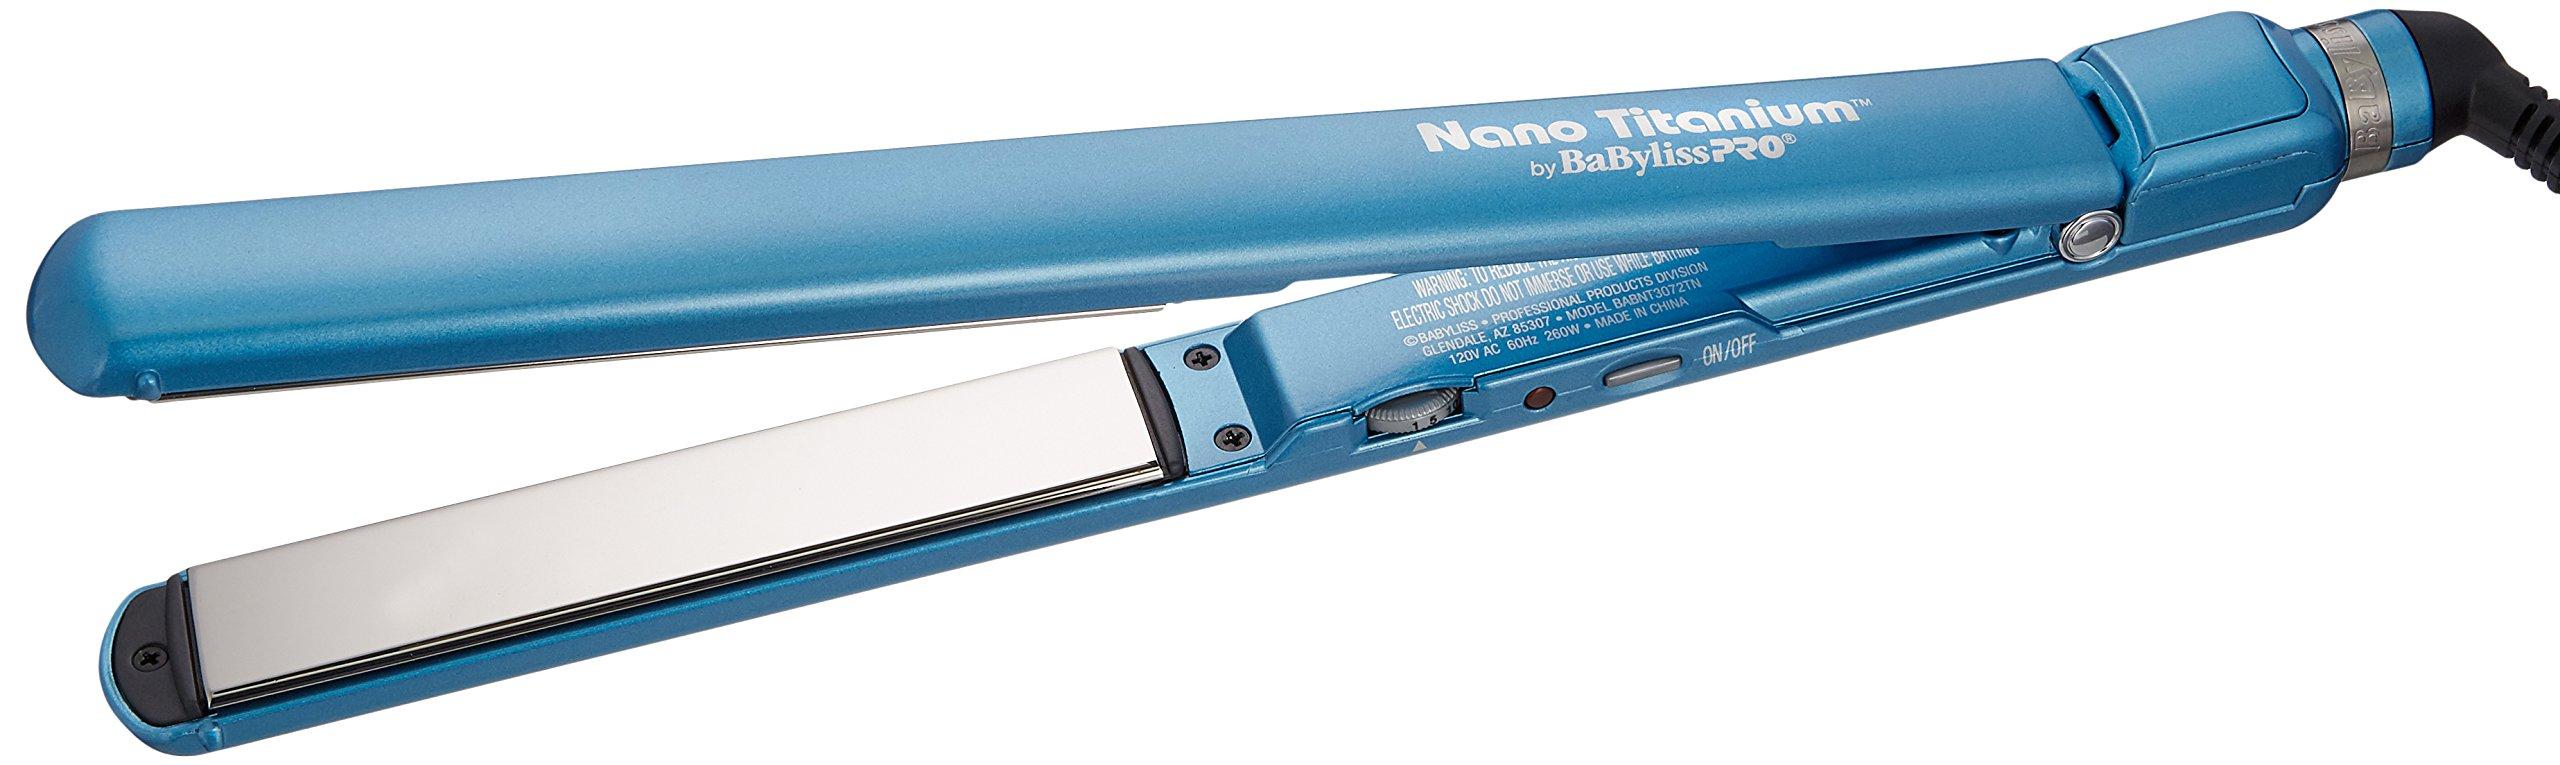 BaByliss Pro BABNT3072 Nano Titanium-Plated Ultra-Thin Straightening Iron, 1 Inch by BaBylissPRO (Image #2)